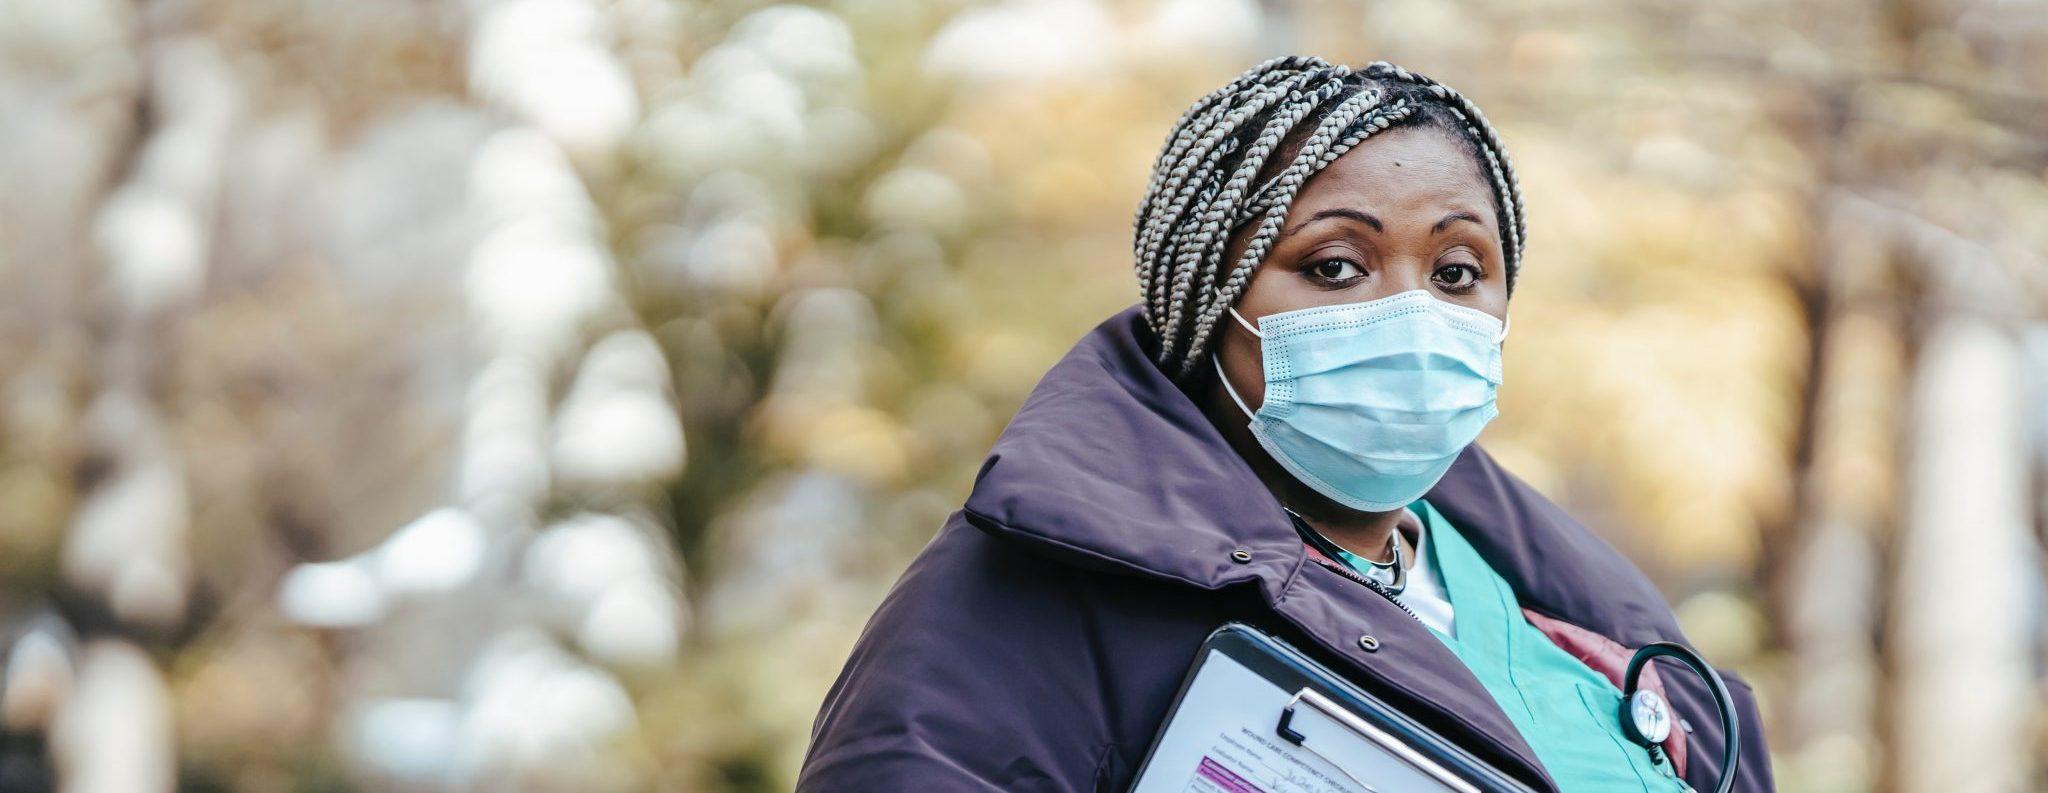 Female Nurse with mask on outside